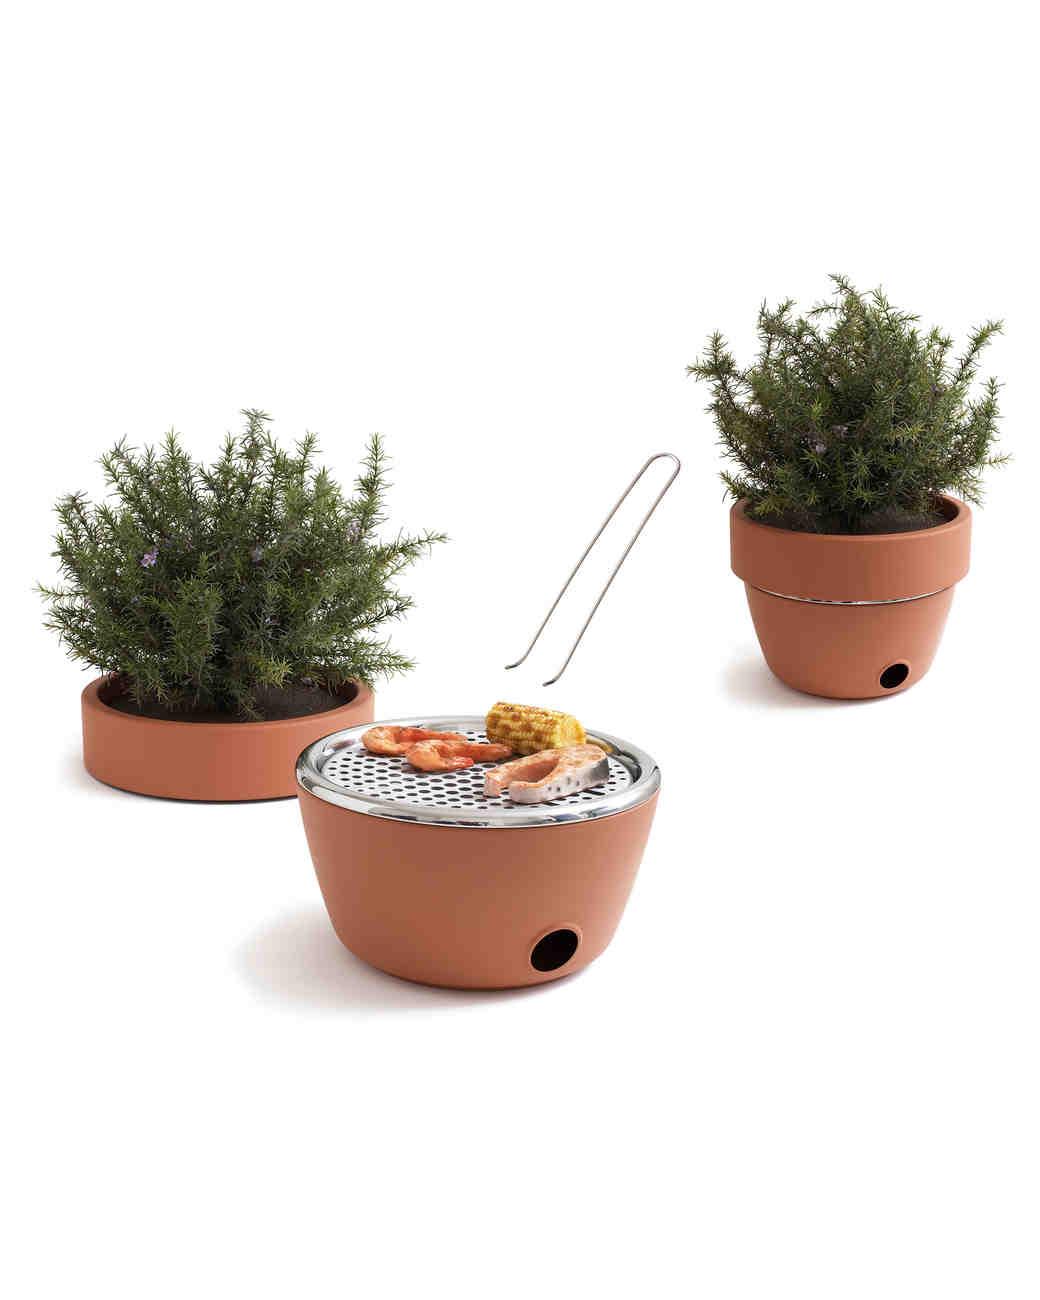 bbqplant-tongs.jpg